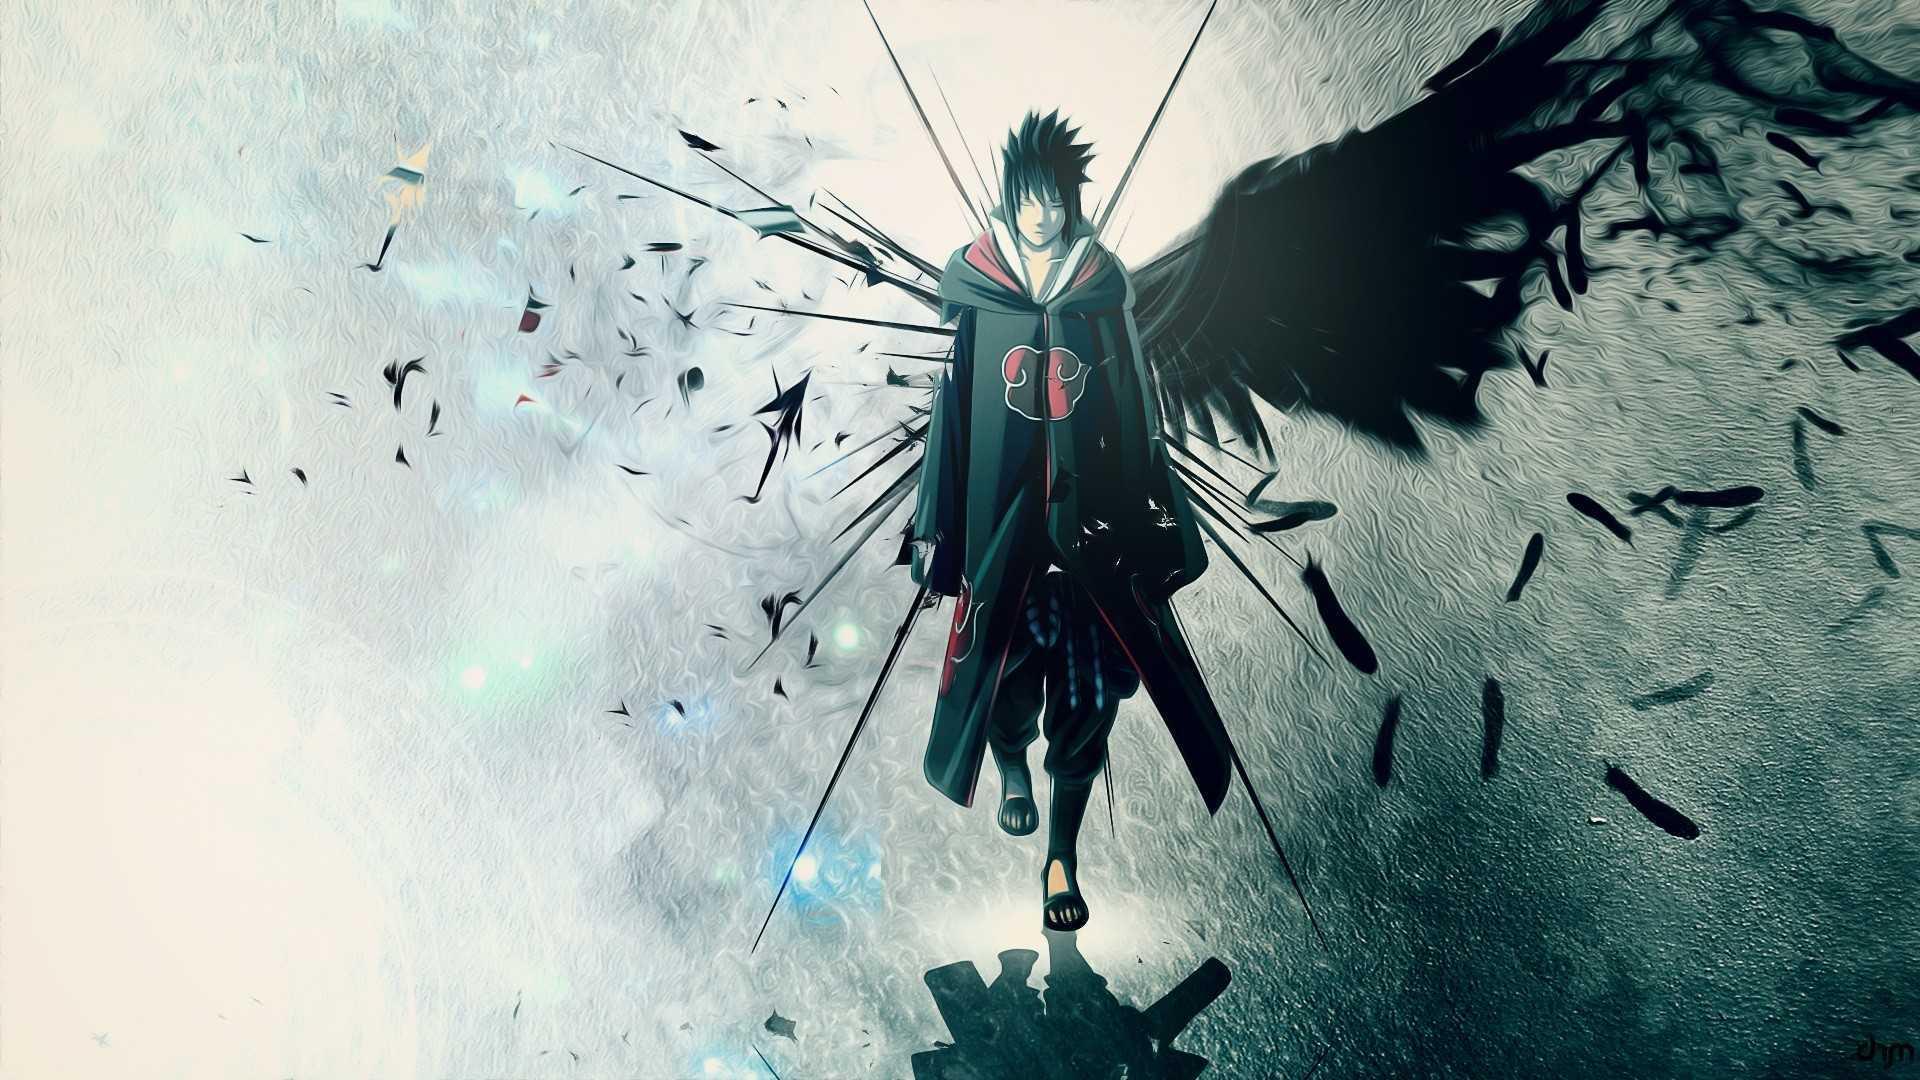 Hd Naruto Wallpaper Hd Background X Image And Hd Desktop